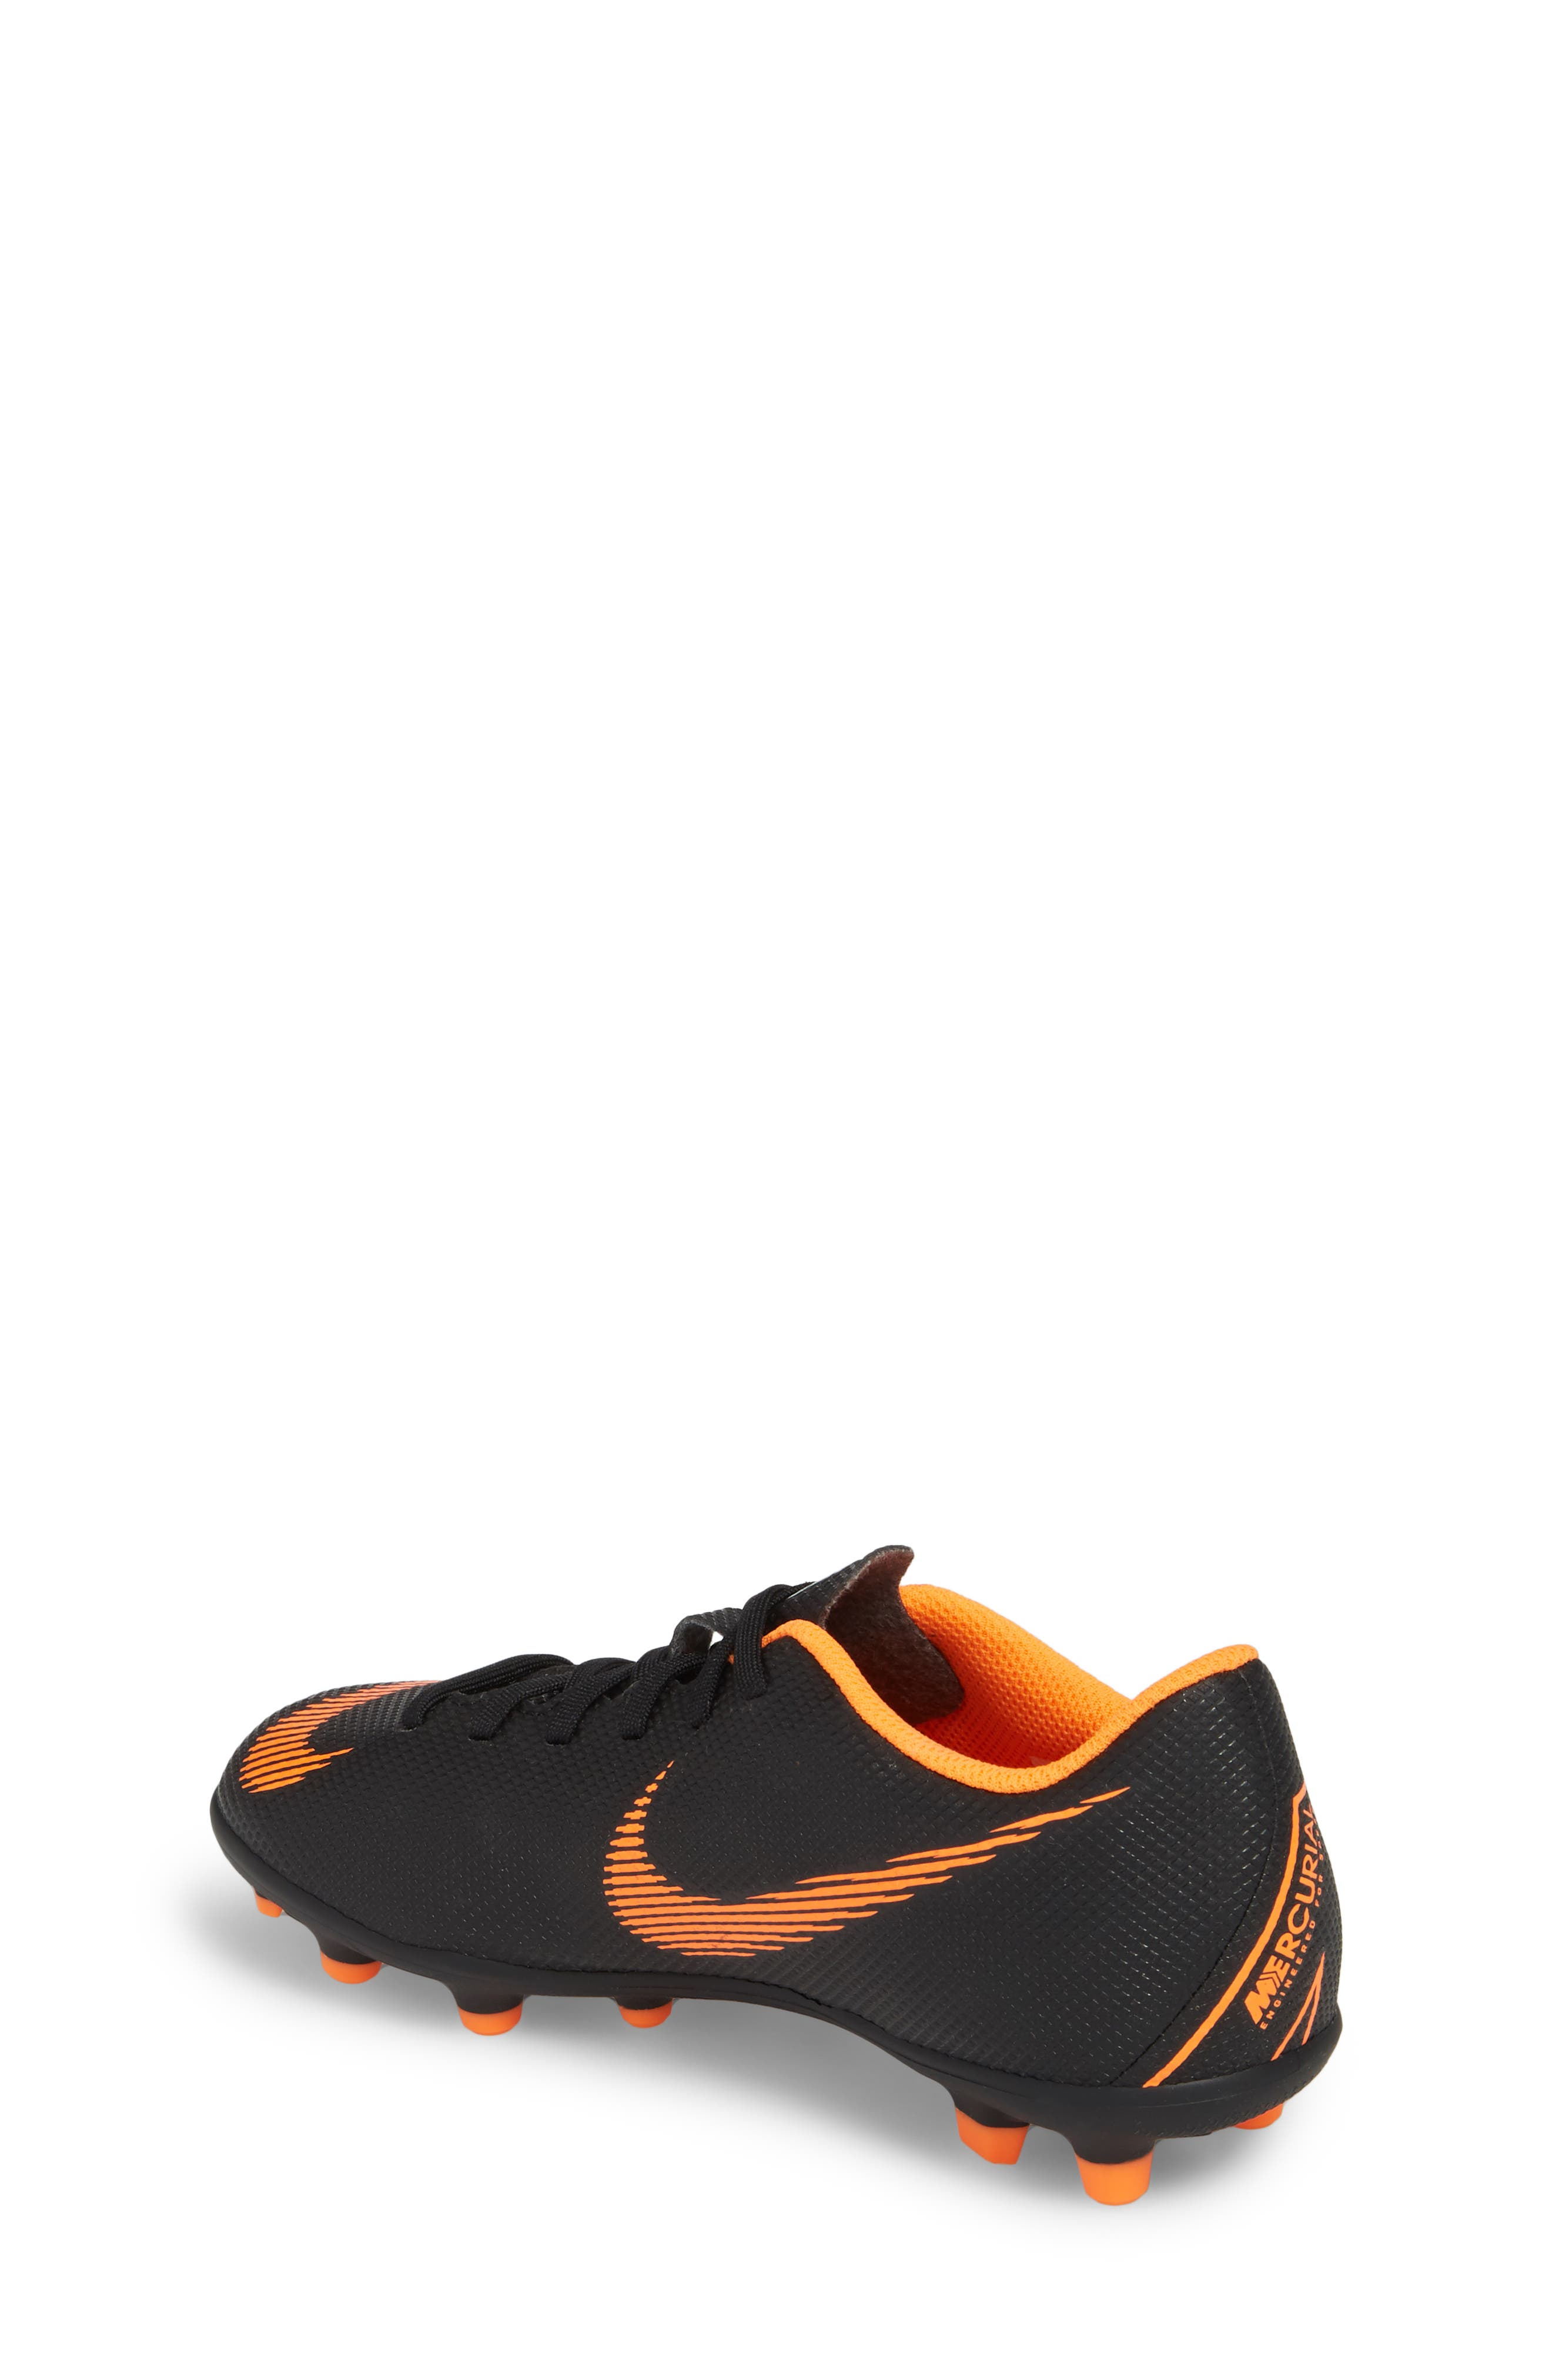 Vapor XII Club Multi Ground Soccer Shoe,                             Alternate thumbnail 2, color,                             Black/ Total Orange/ White